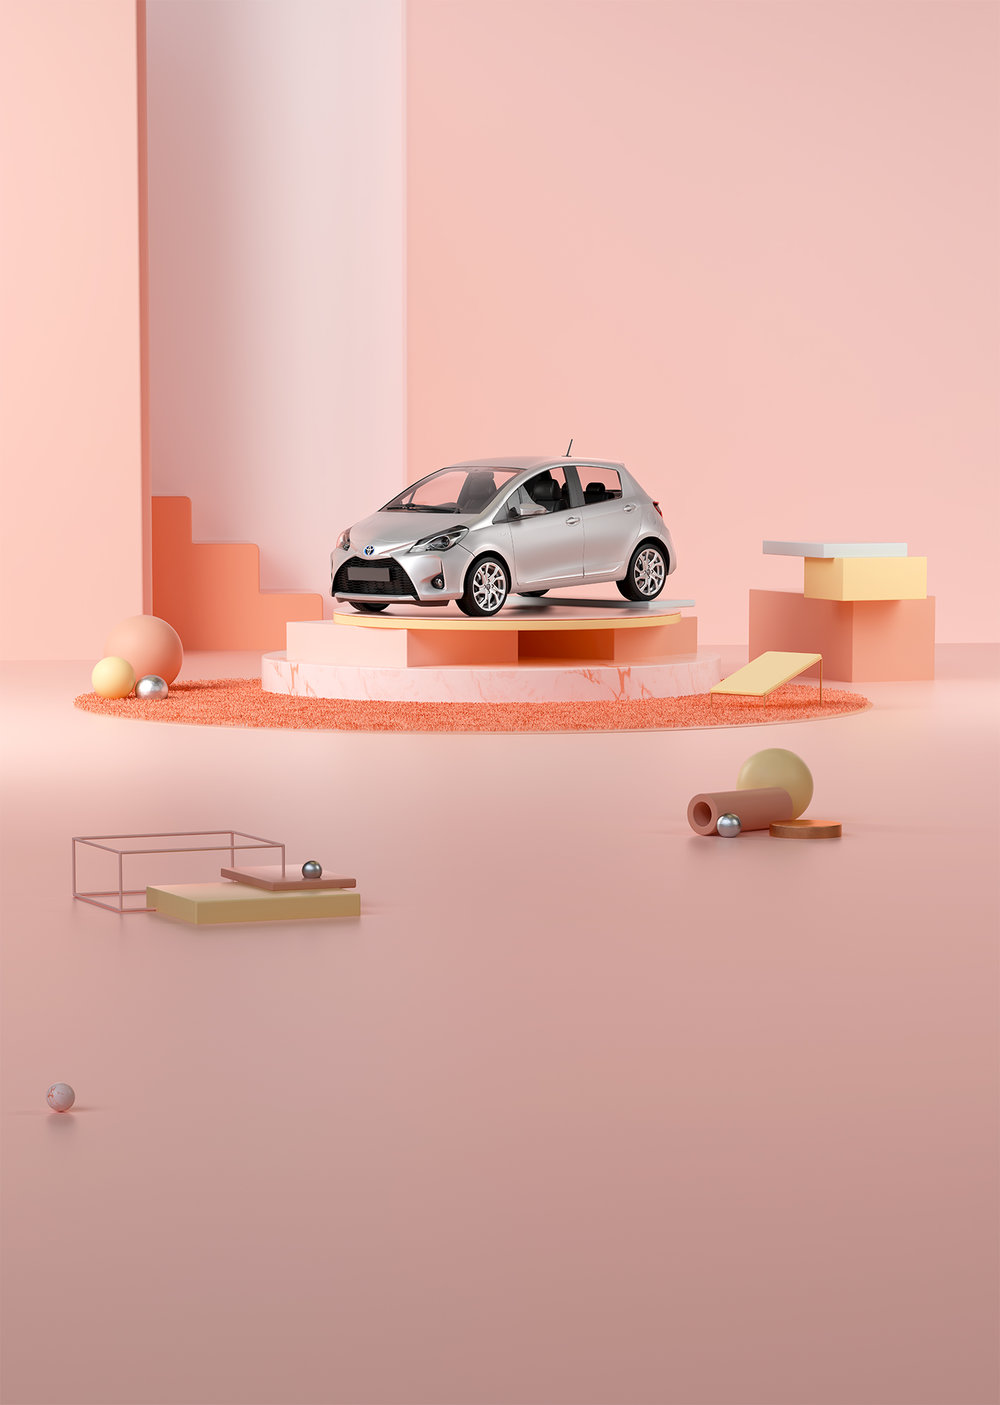 Cars_bankia_Toyota_Yaris_02__15.jpg